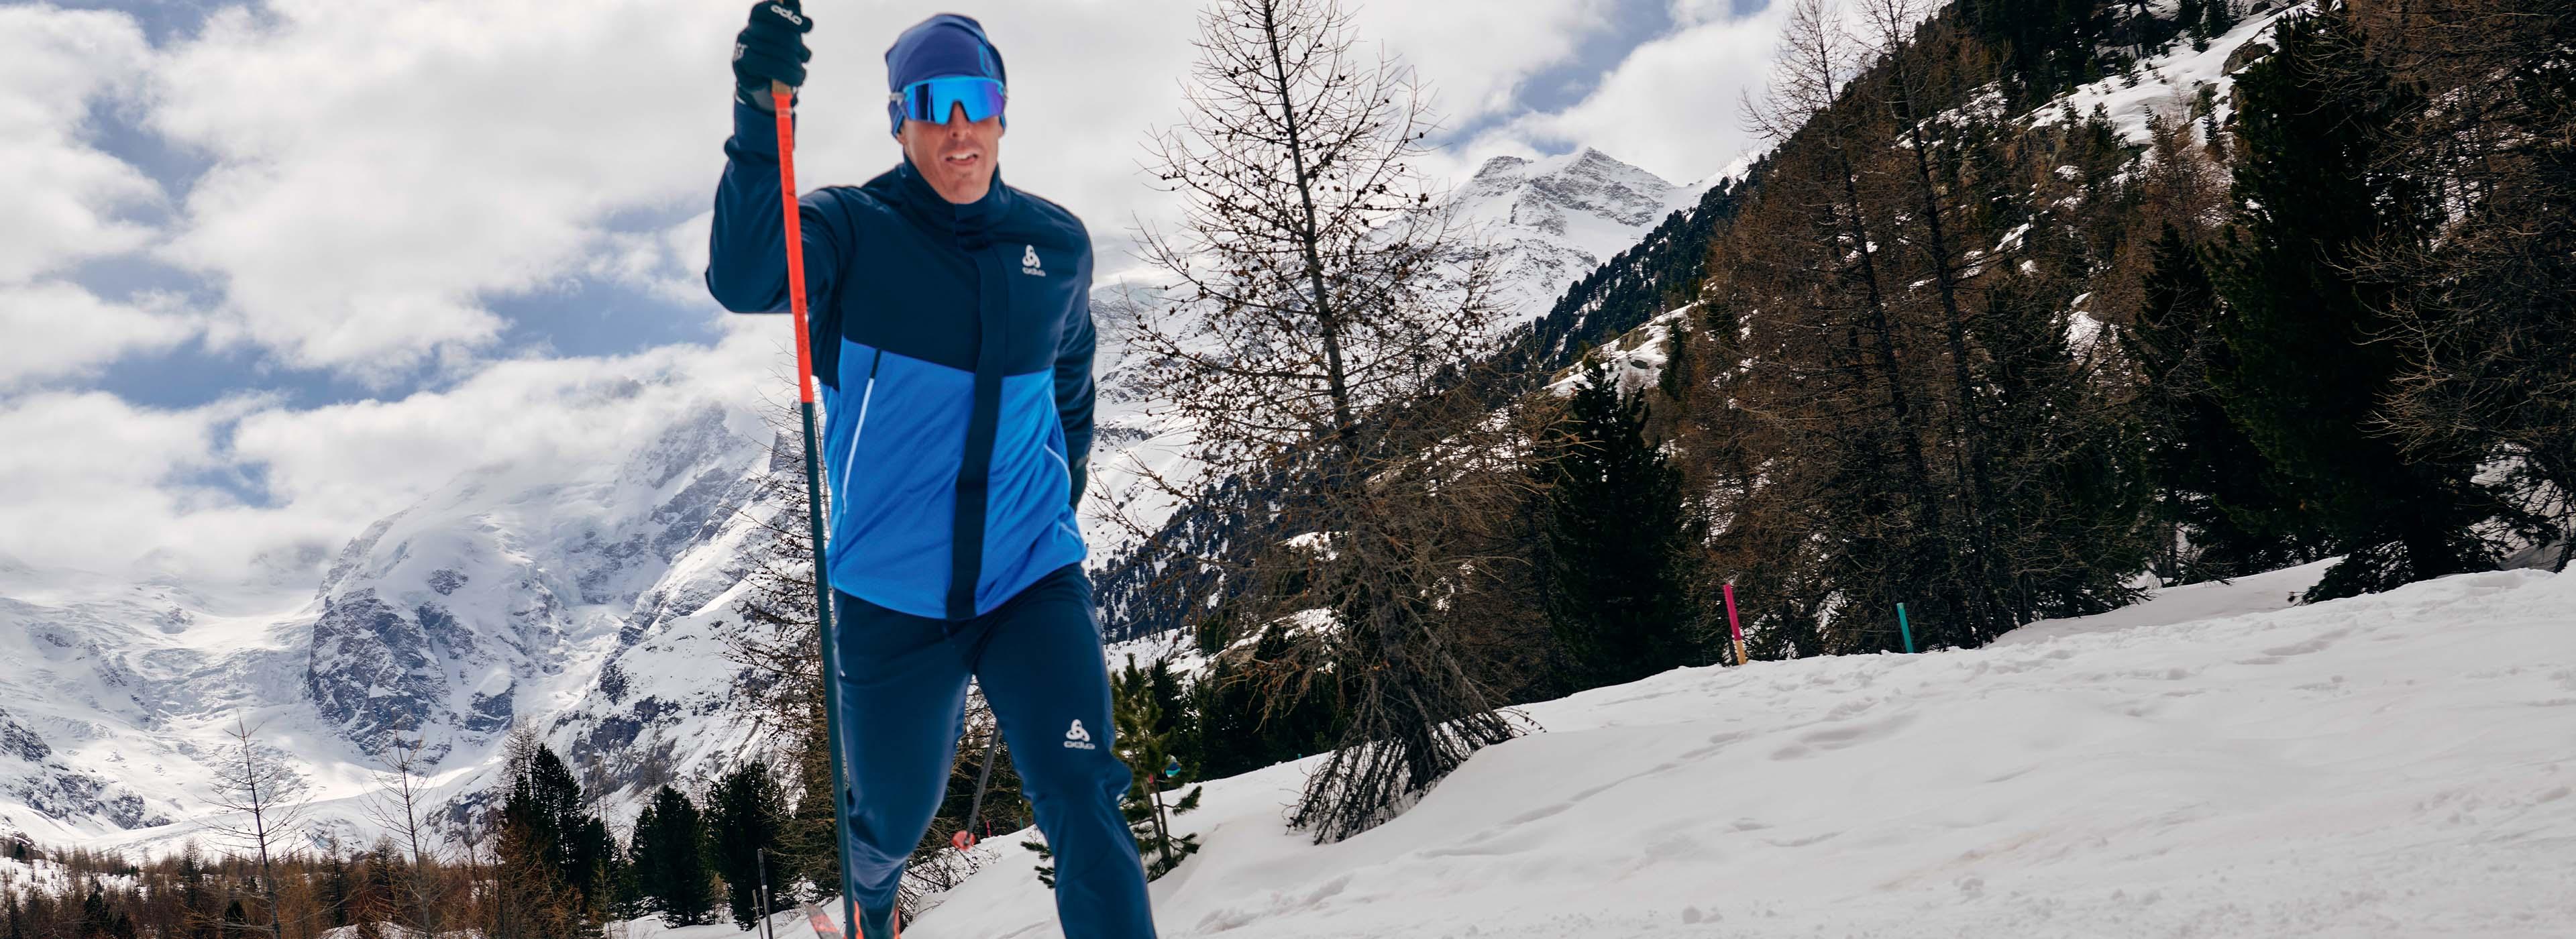 New cross ski collection Fall Winter 2021